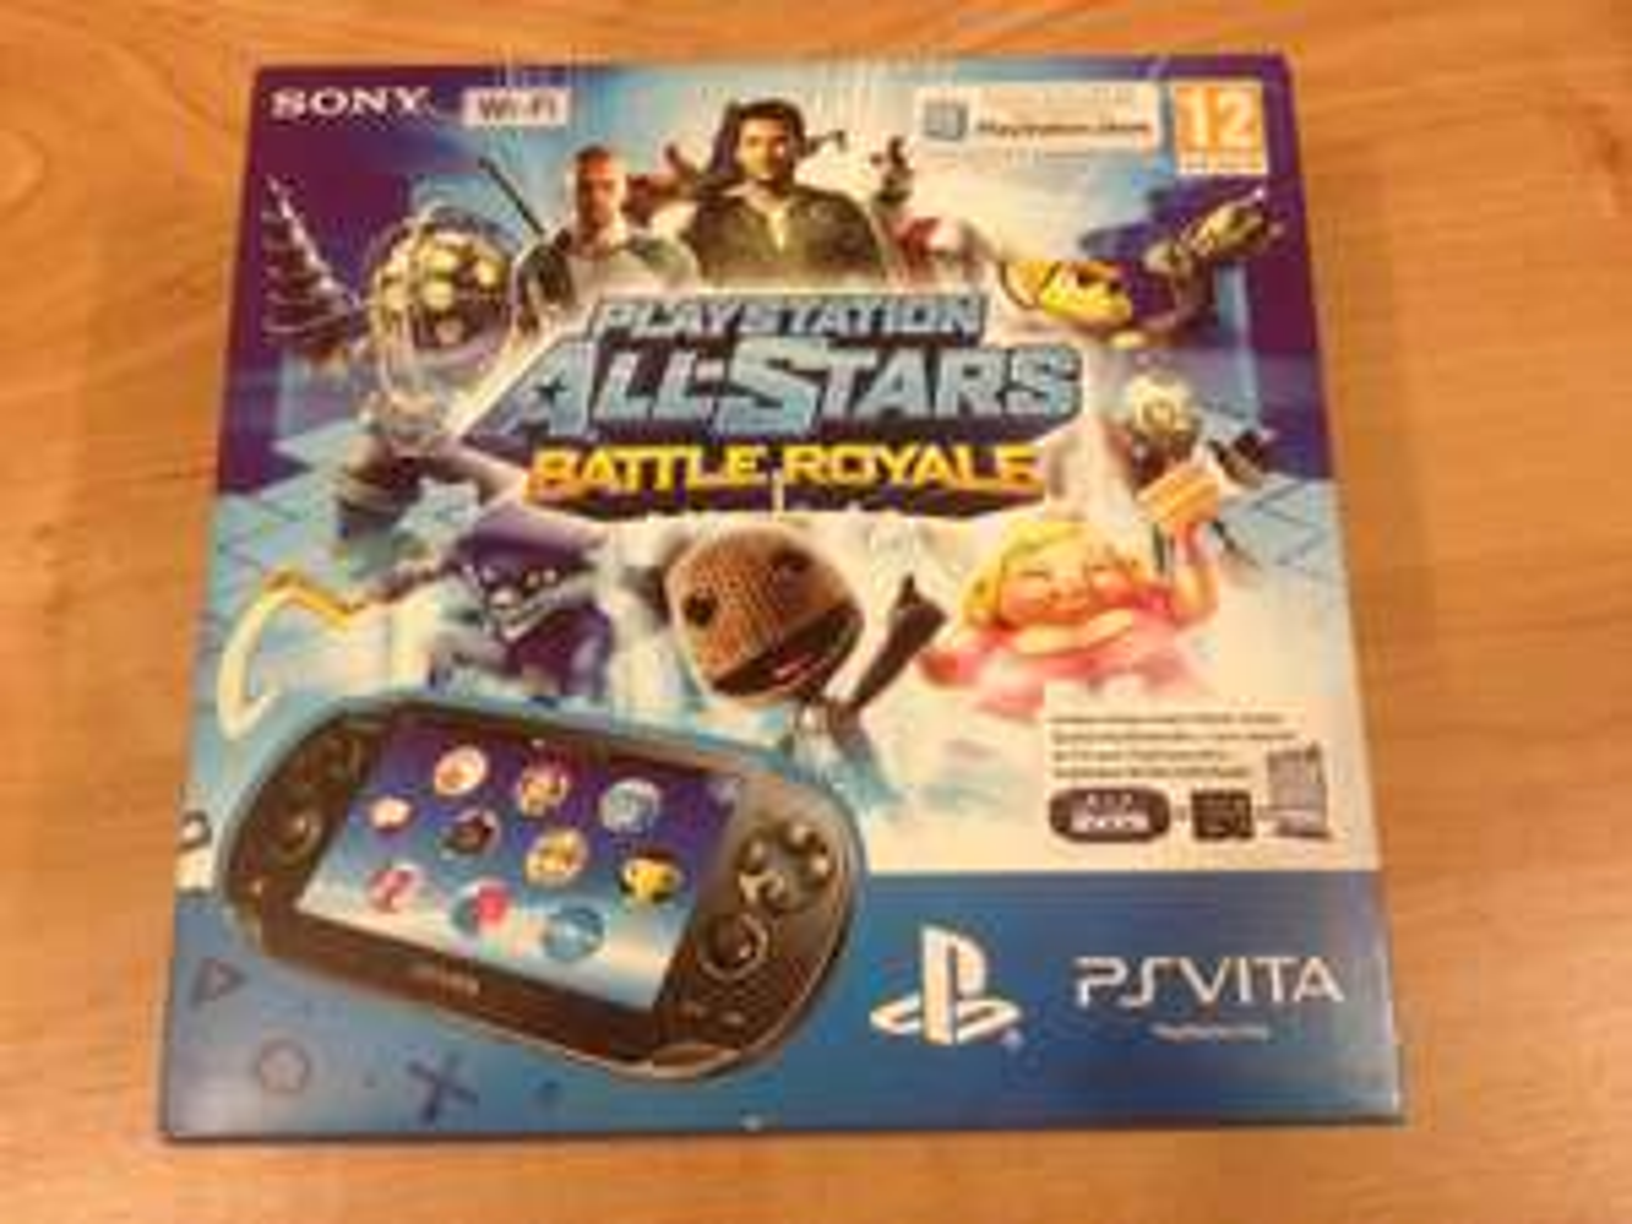 Pack PS Vita Playstation All-Stars Battle Royale